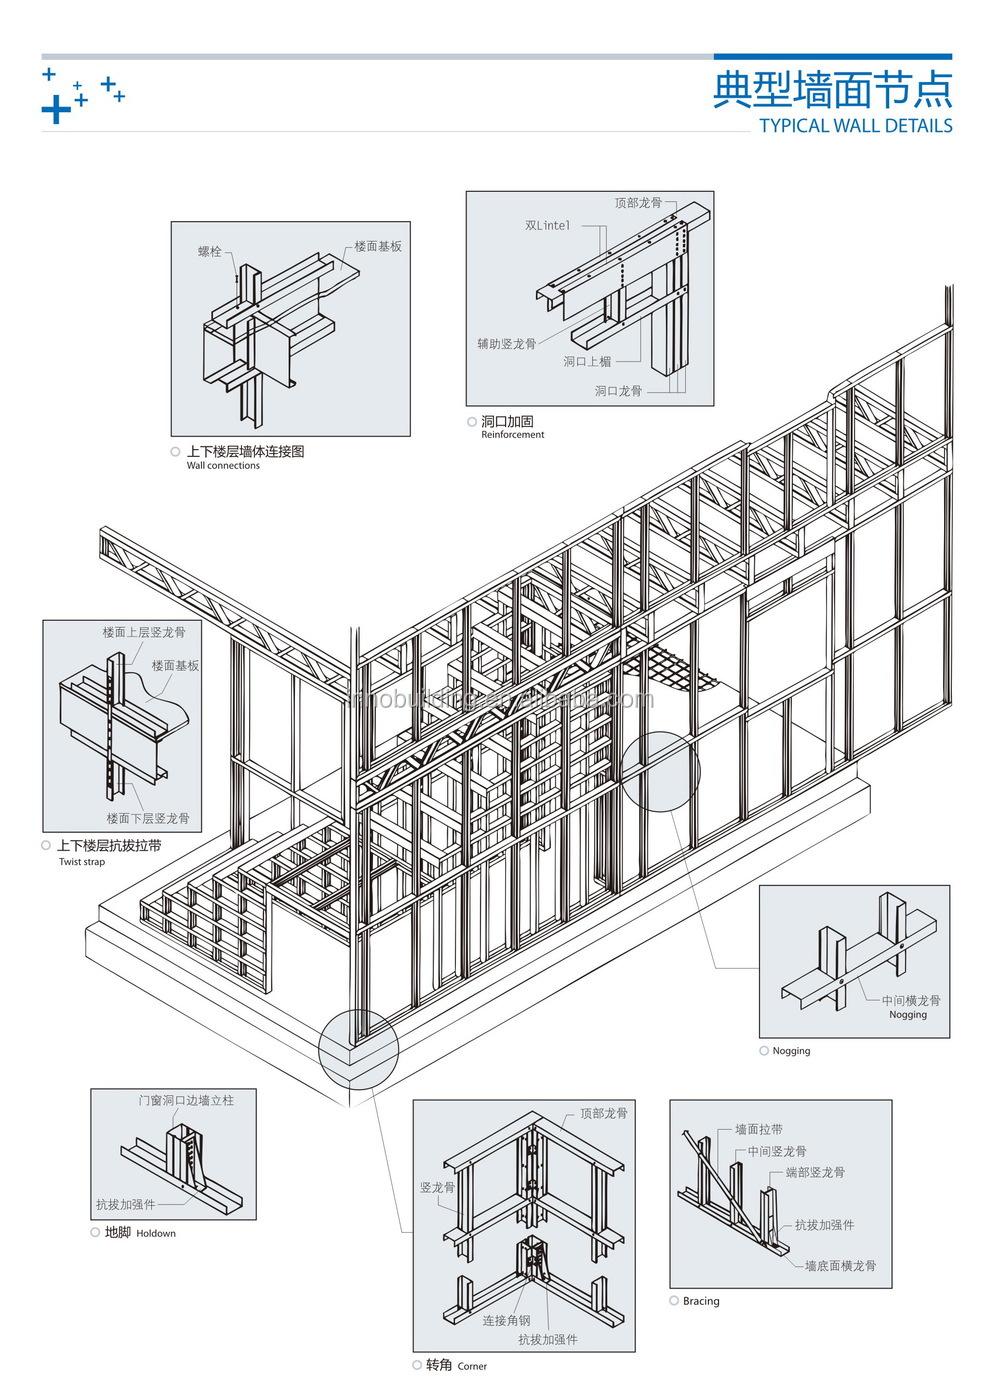 australian design rules 3 pdf